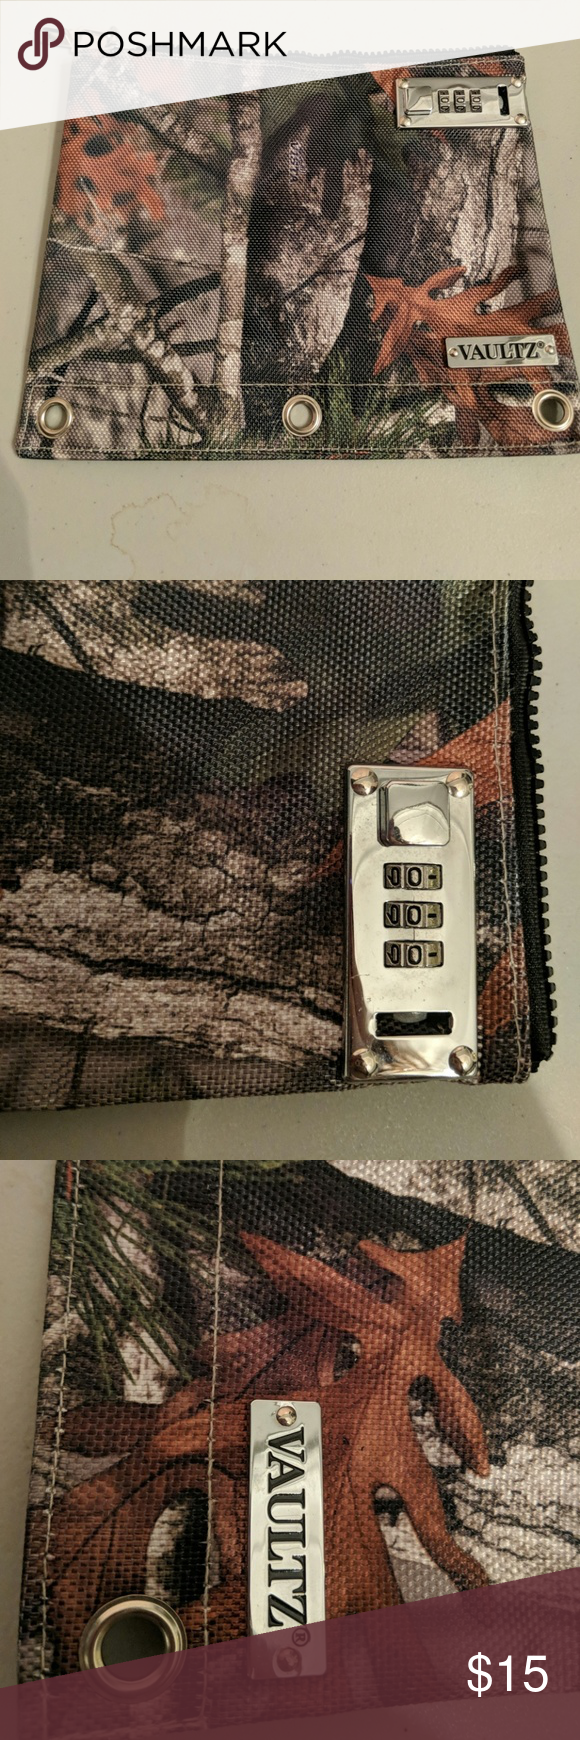 New Vaultz Three Ring Combination Lock Pouch My Posh Picks